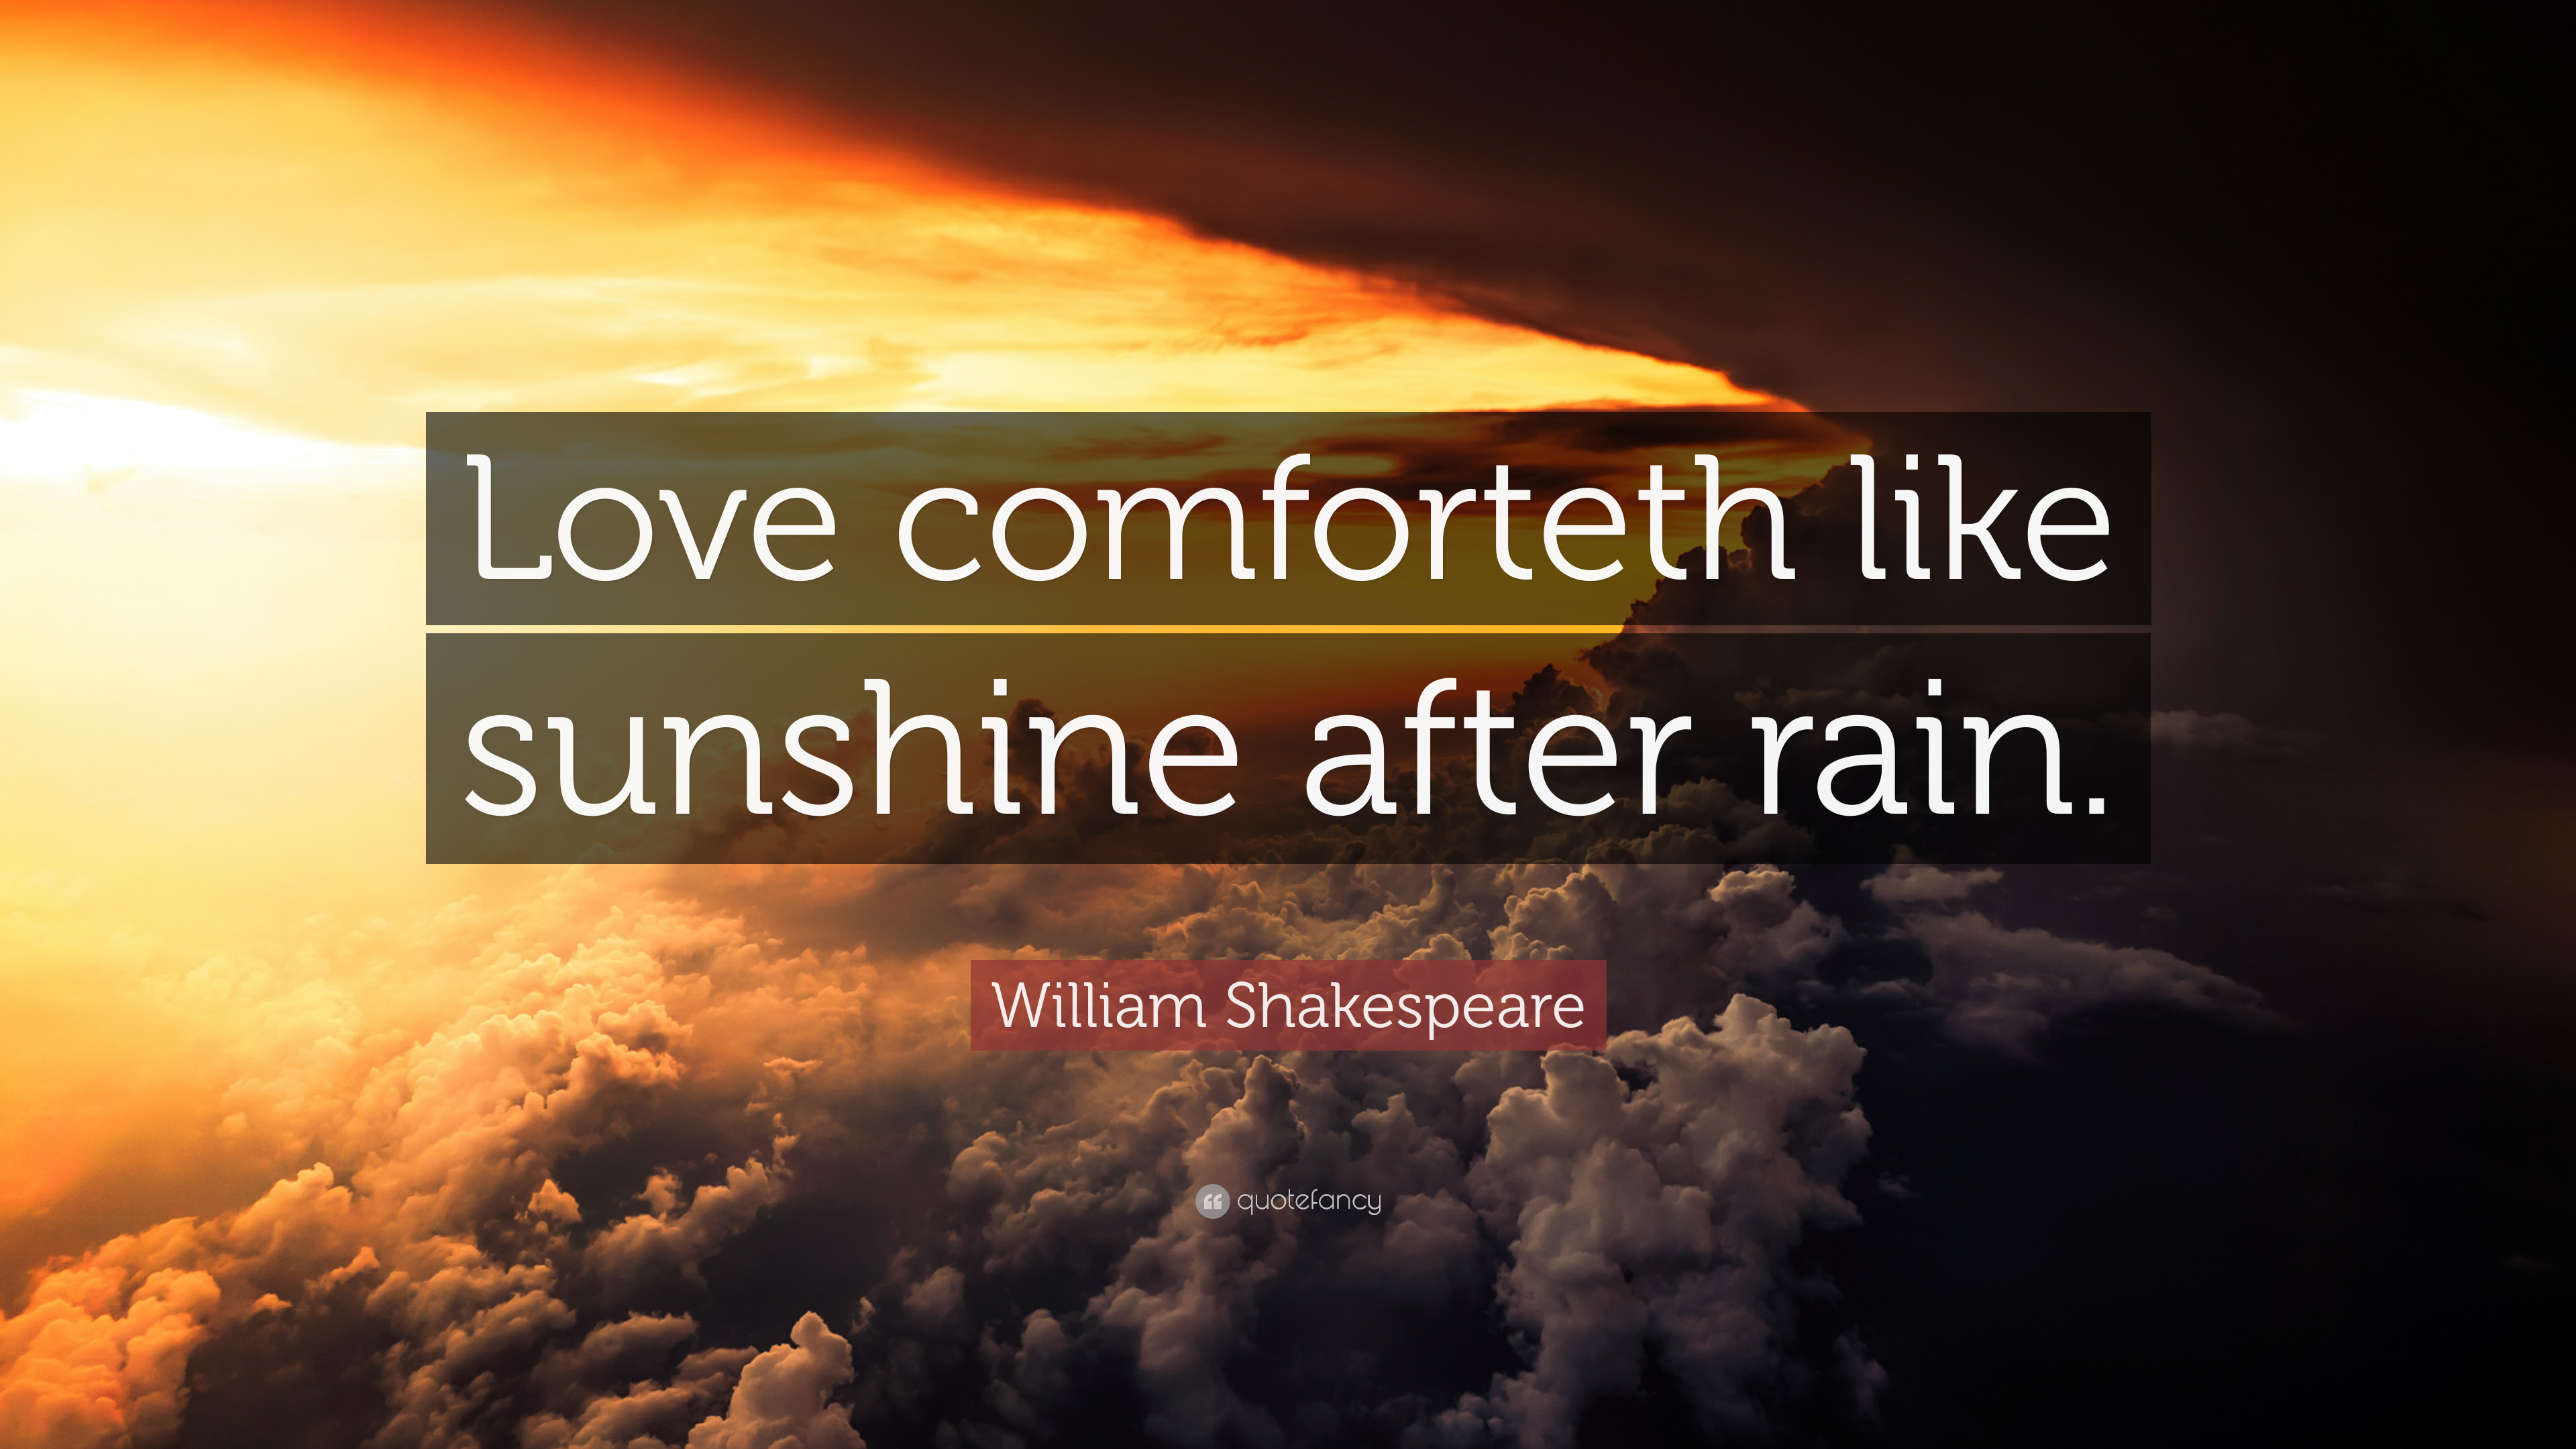 William Shakespeare Quote Love Comforteth Like Sunshine After Rain